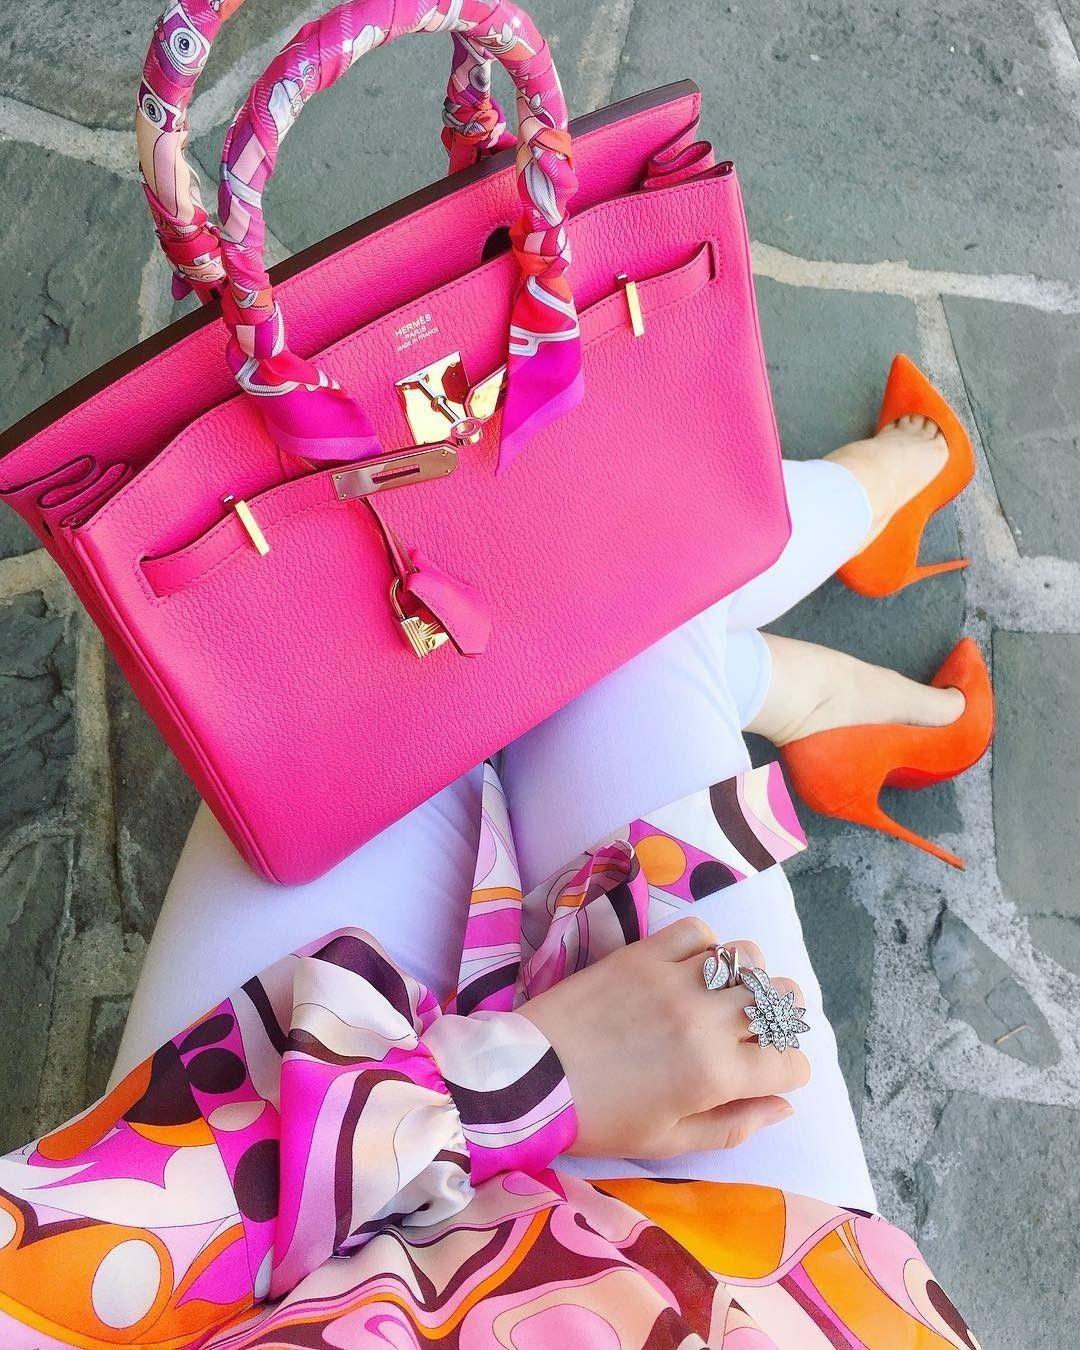 f56cbda63 Hermès Birkin in fuscia pink | moda elegante en 2019 | Bolsos ...